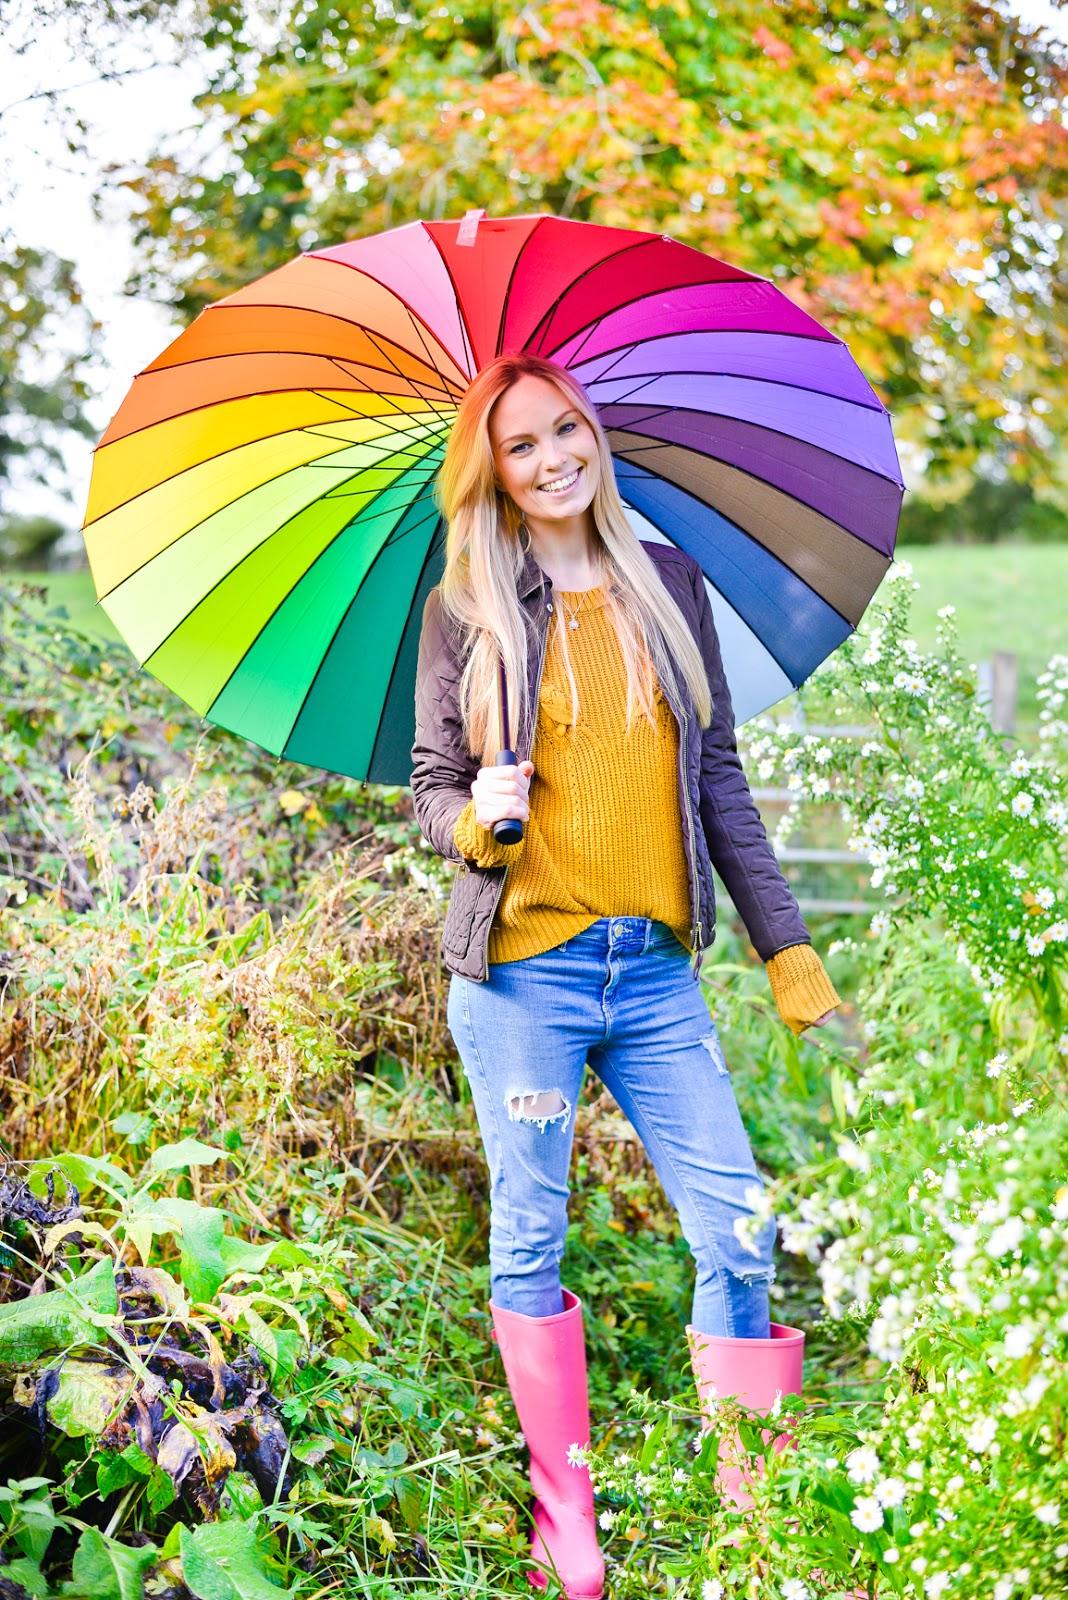 rainbow umbrella, Wonderwelly, wonder wellies, pink wellies, mindfulness outsides, outside wellbeing, outdoors wellbeing